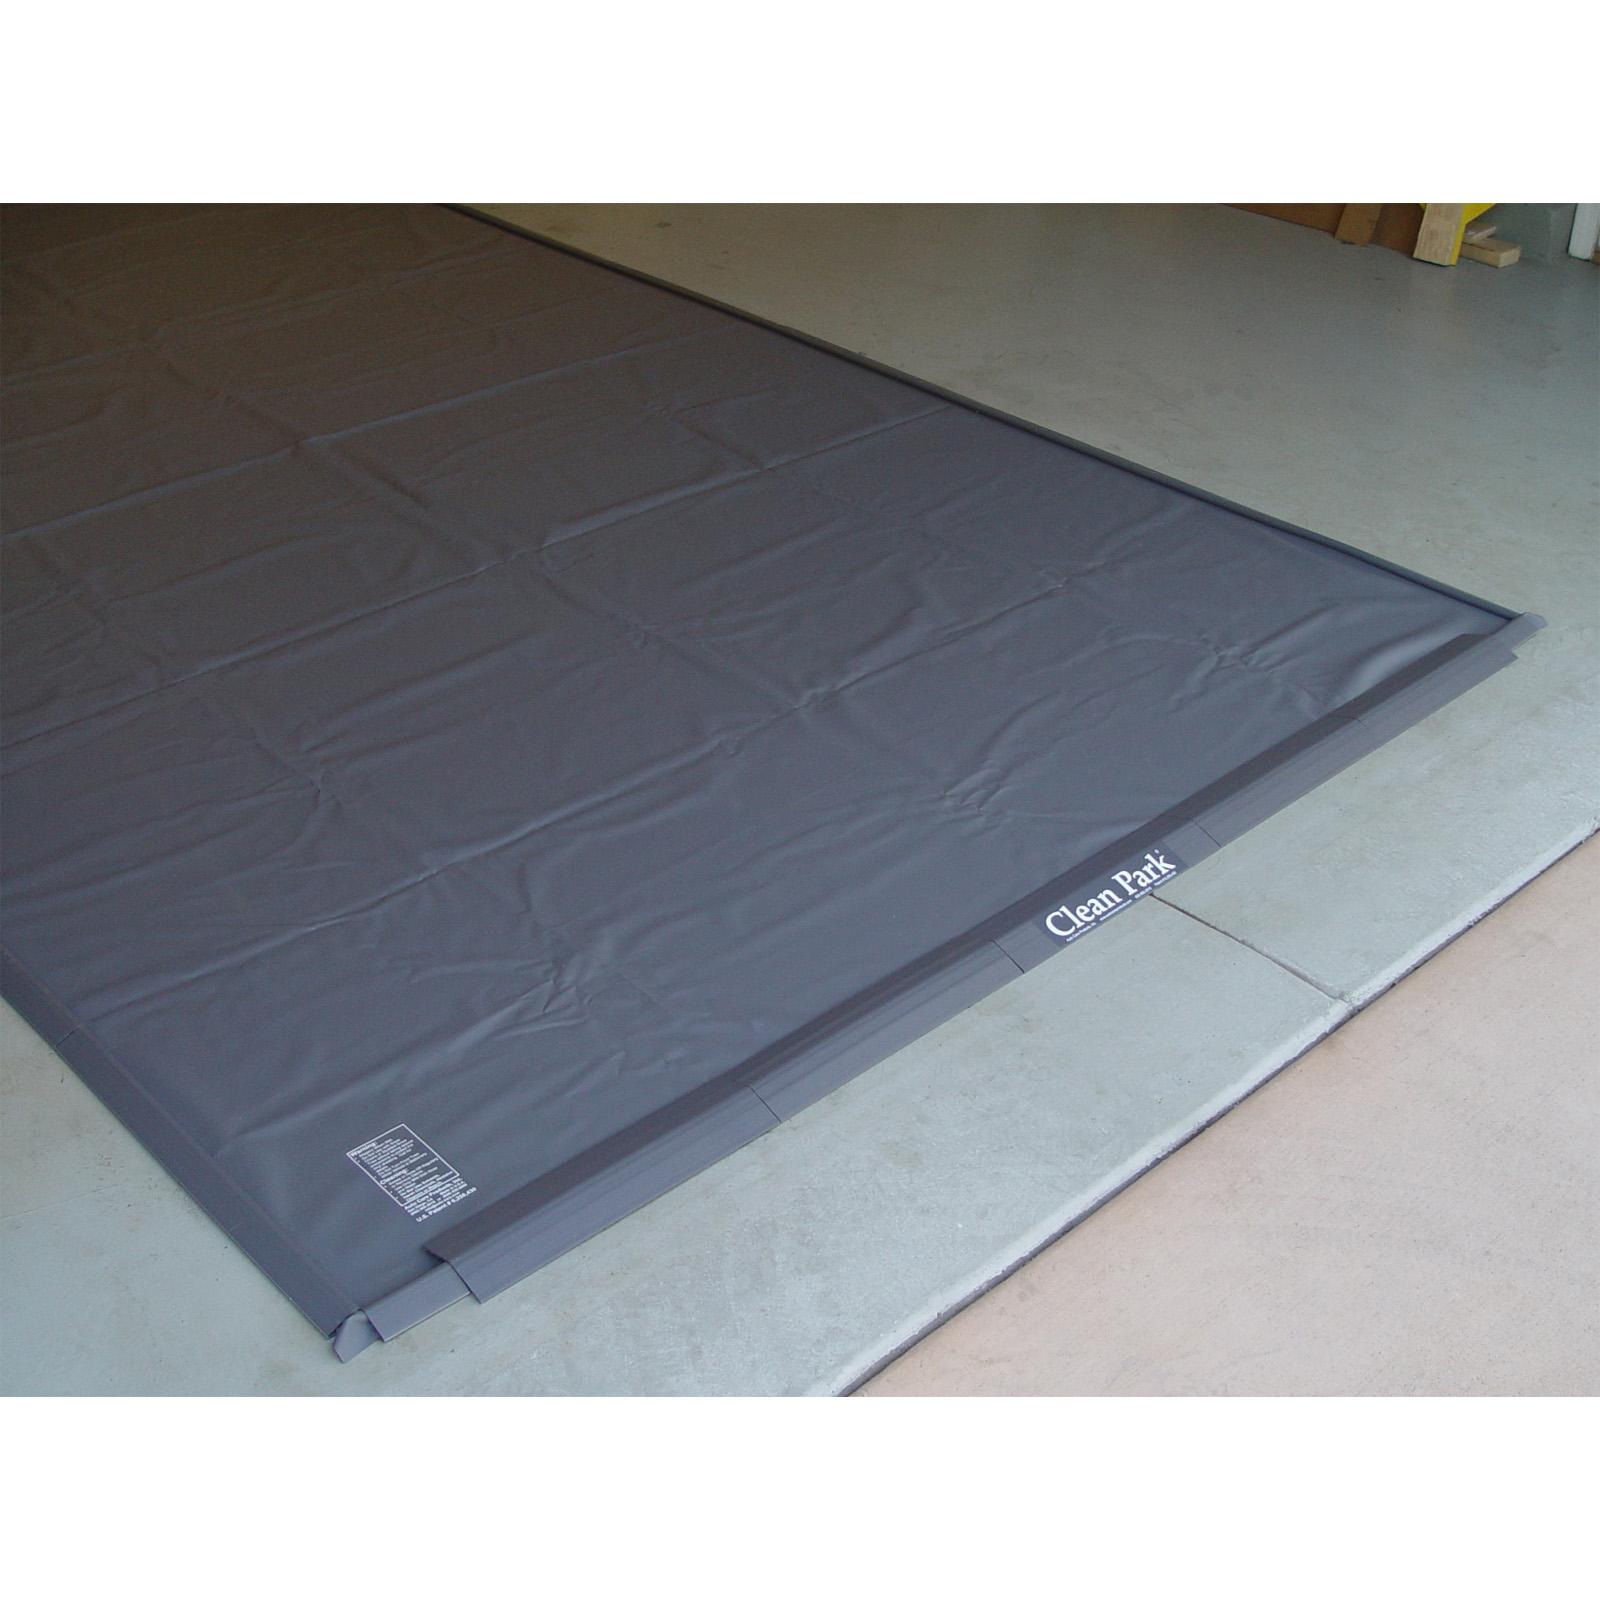 Image of Clean Park 7.5' x 14' Heavy Duty Garage Mat